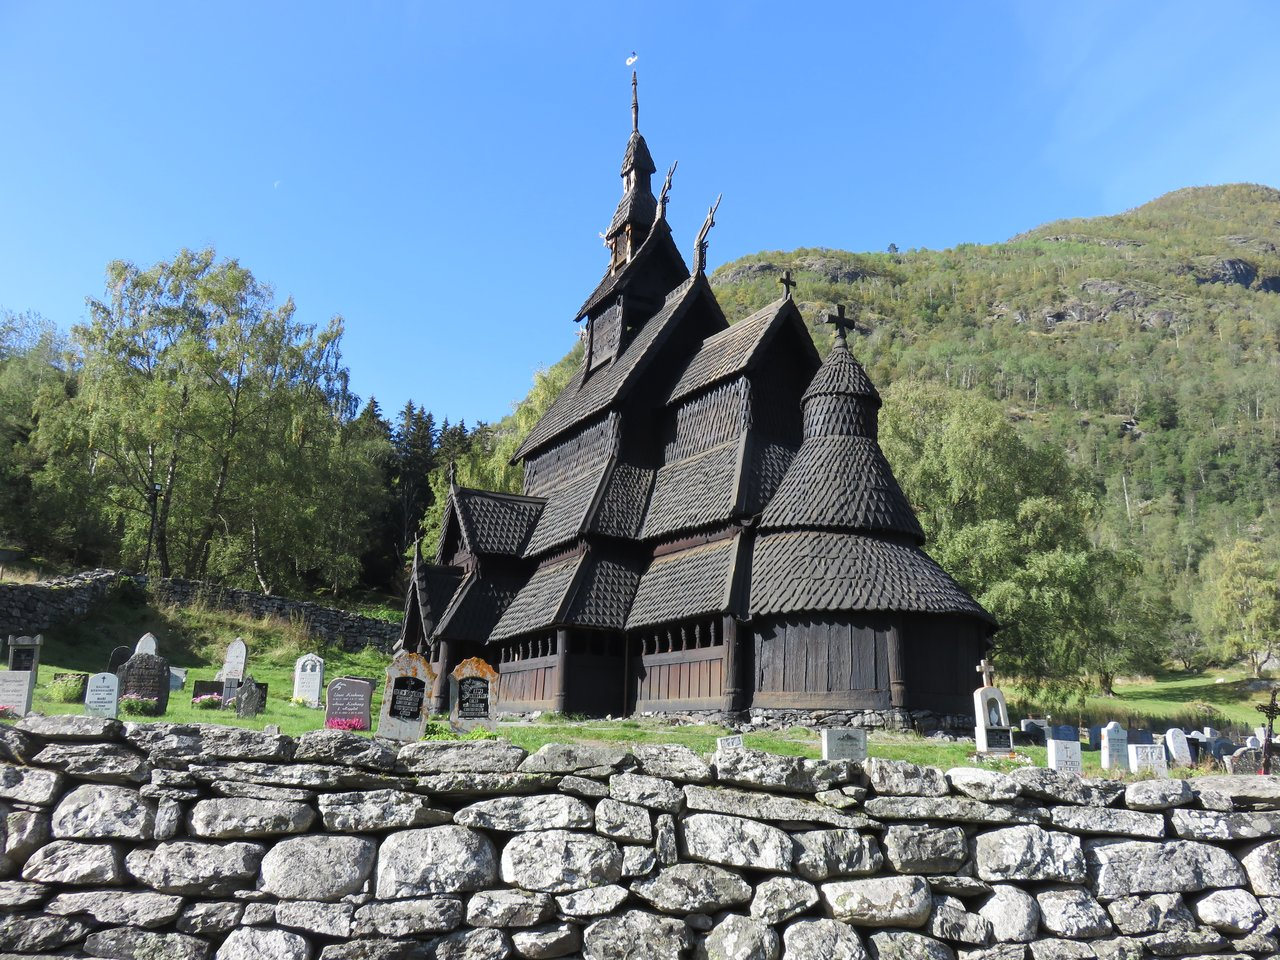 Borgund Stave Church | Photo taken by Mary K